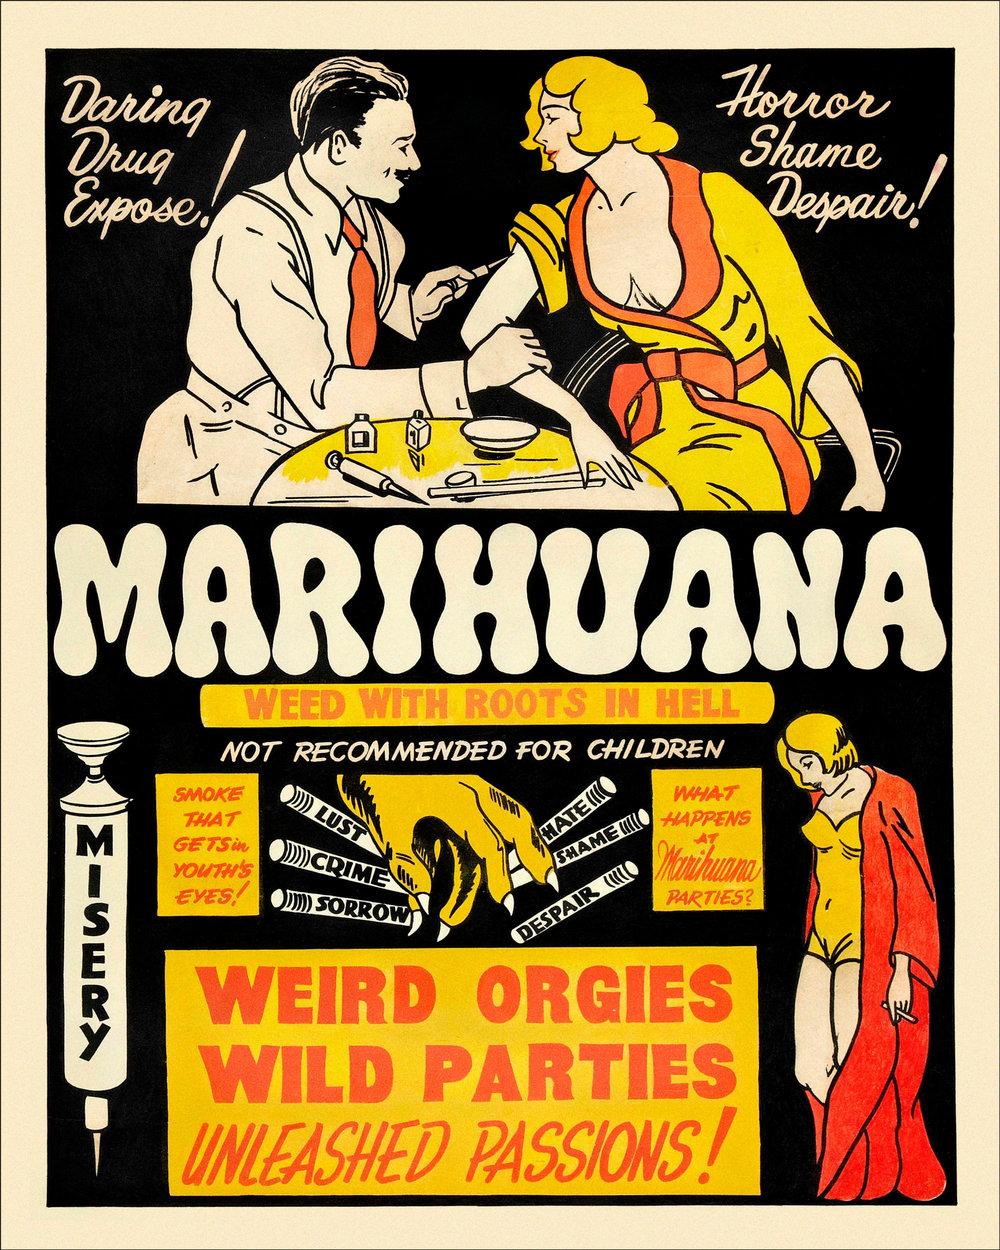 pm8_sd_dru_marijuana-horror-poster_F.jpg